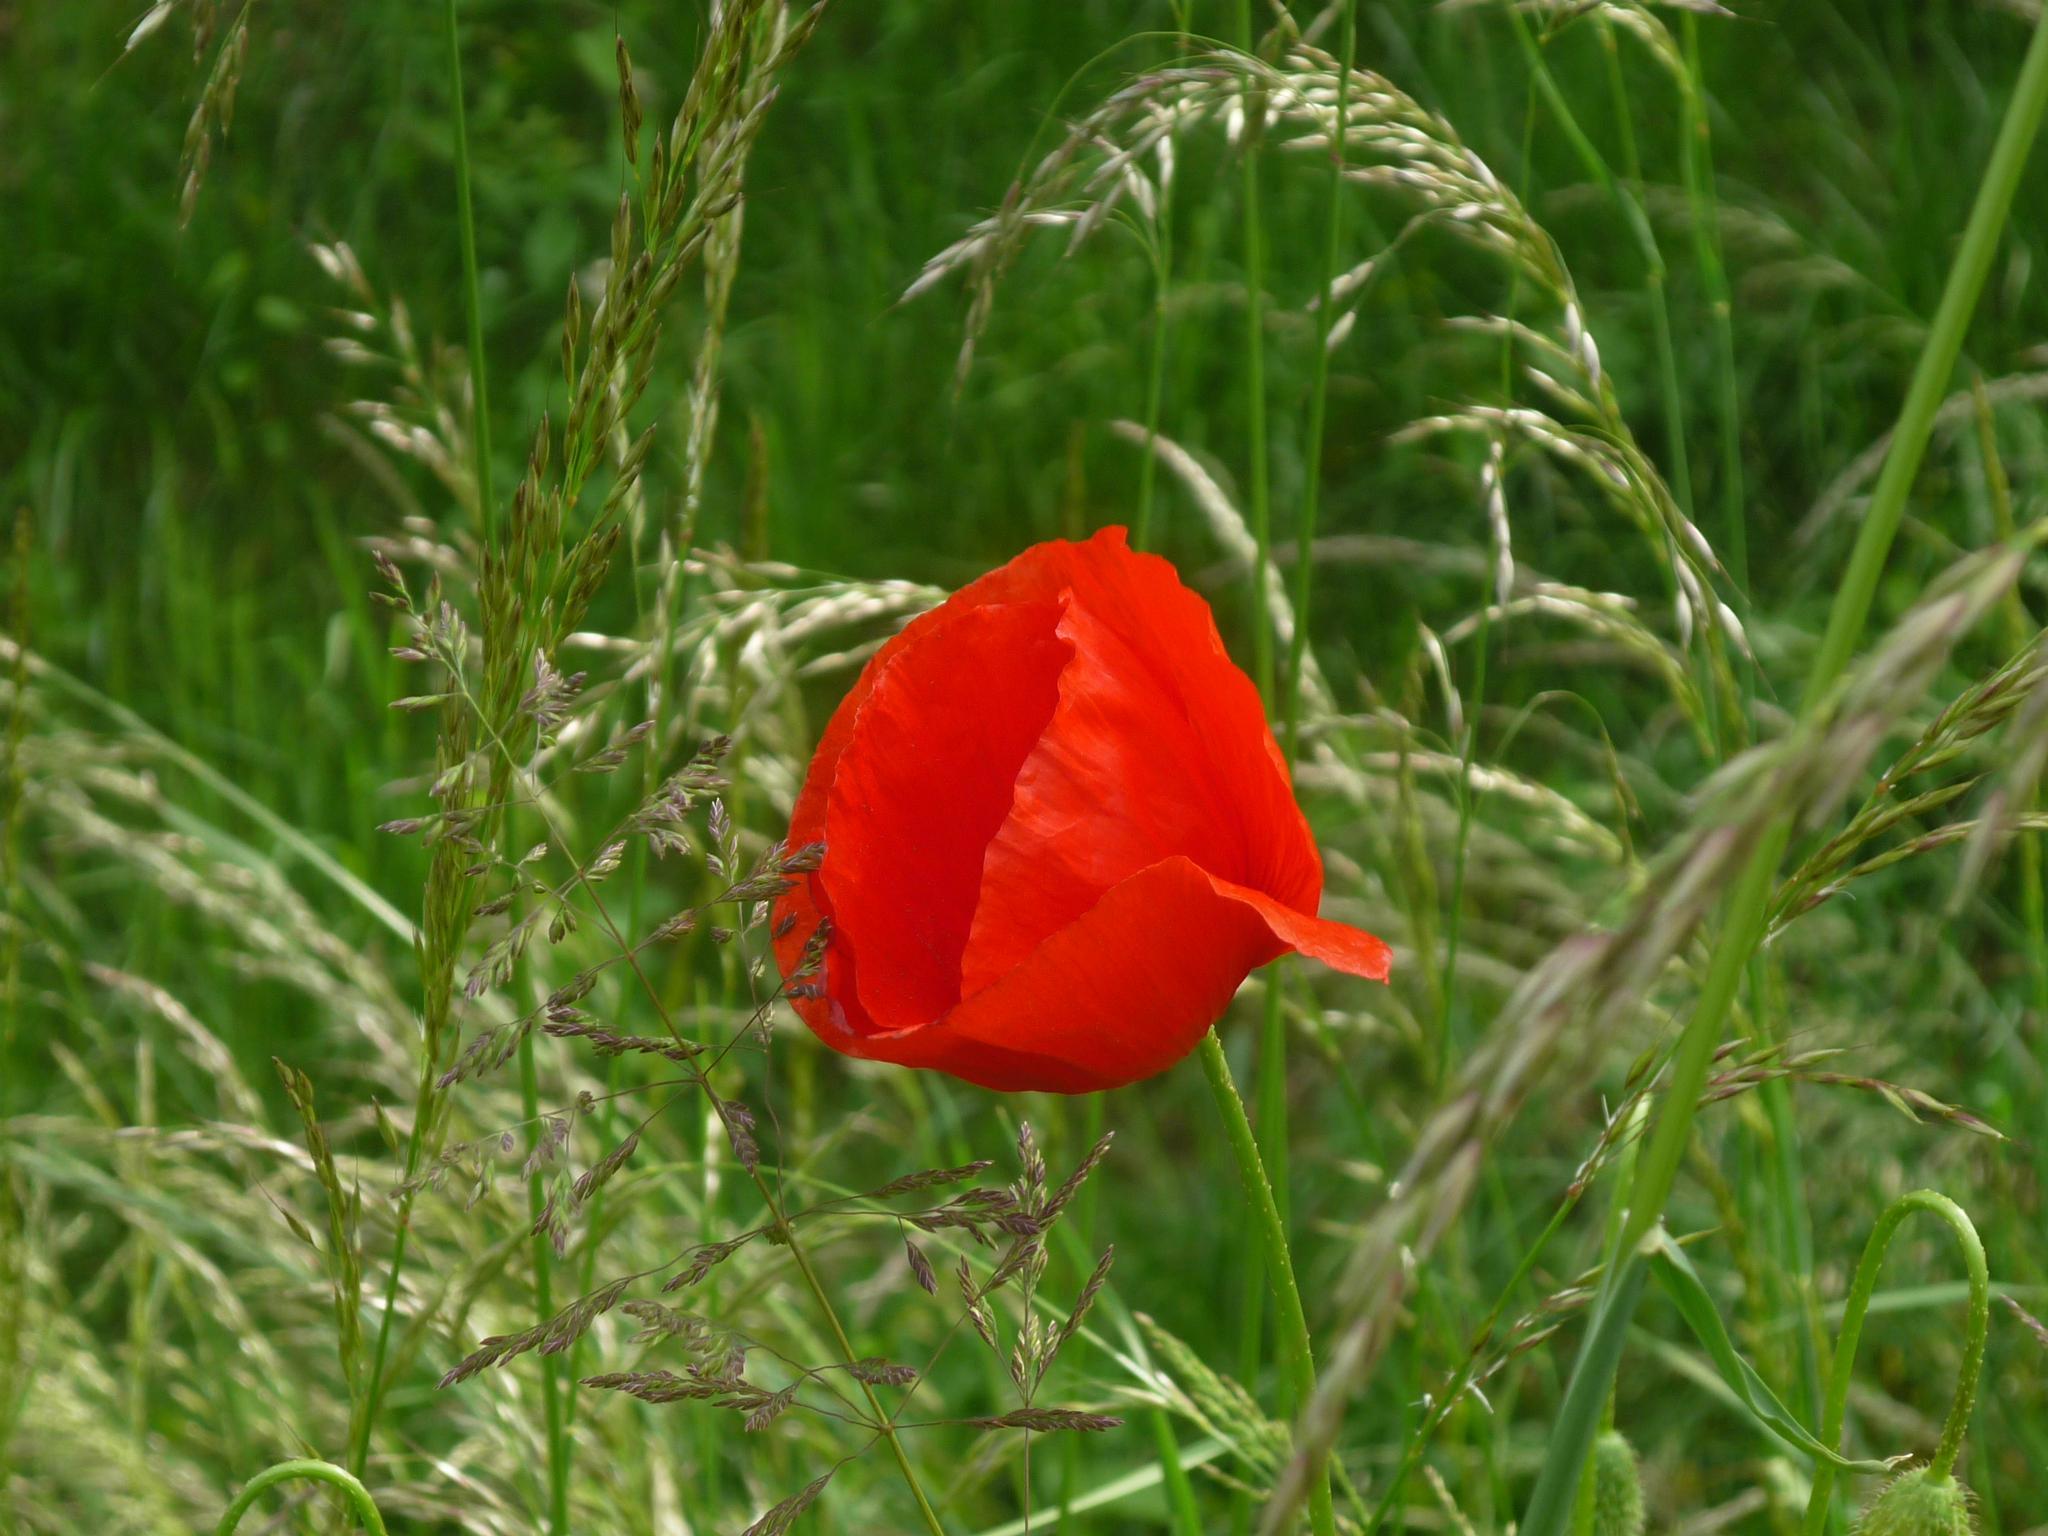 Poppy Red One by husky.blue.river